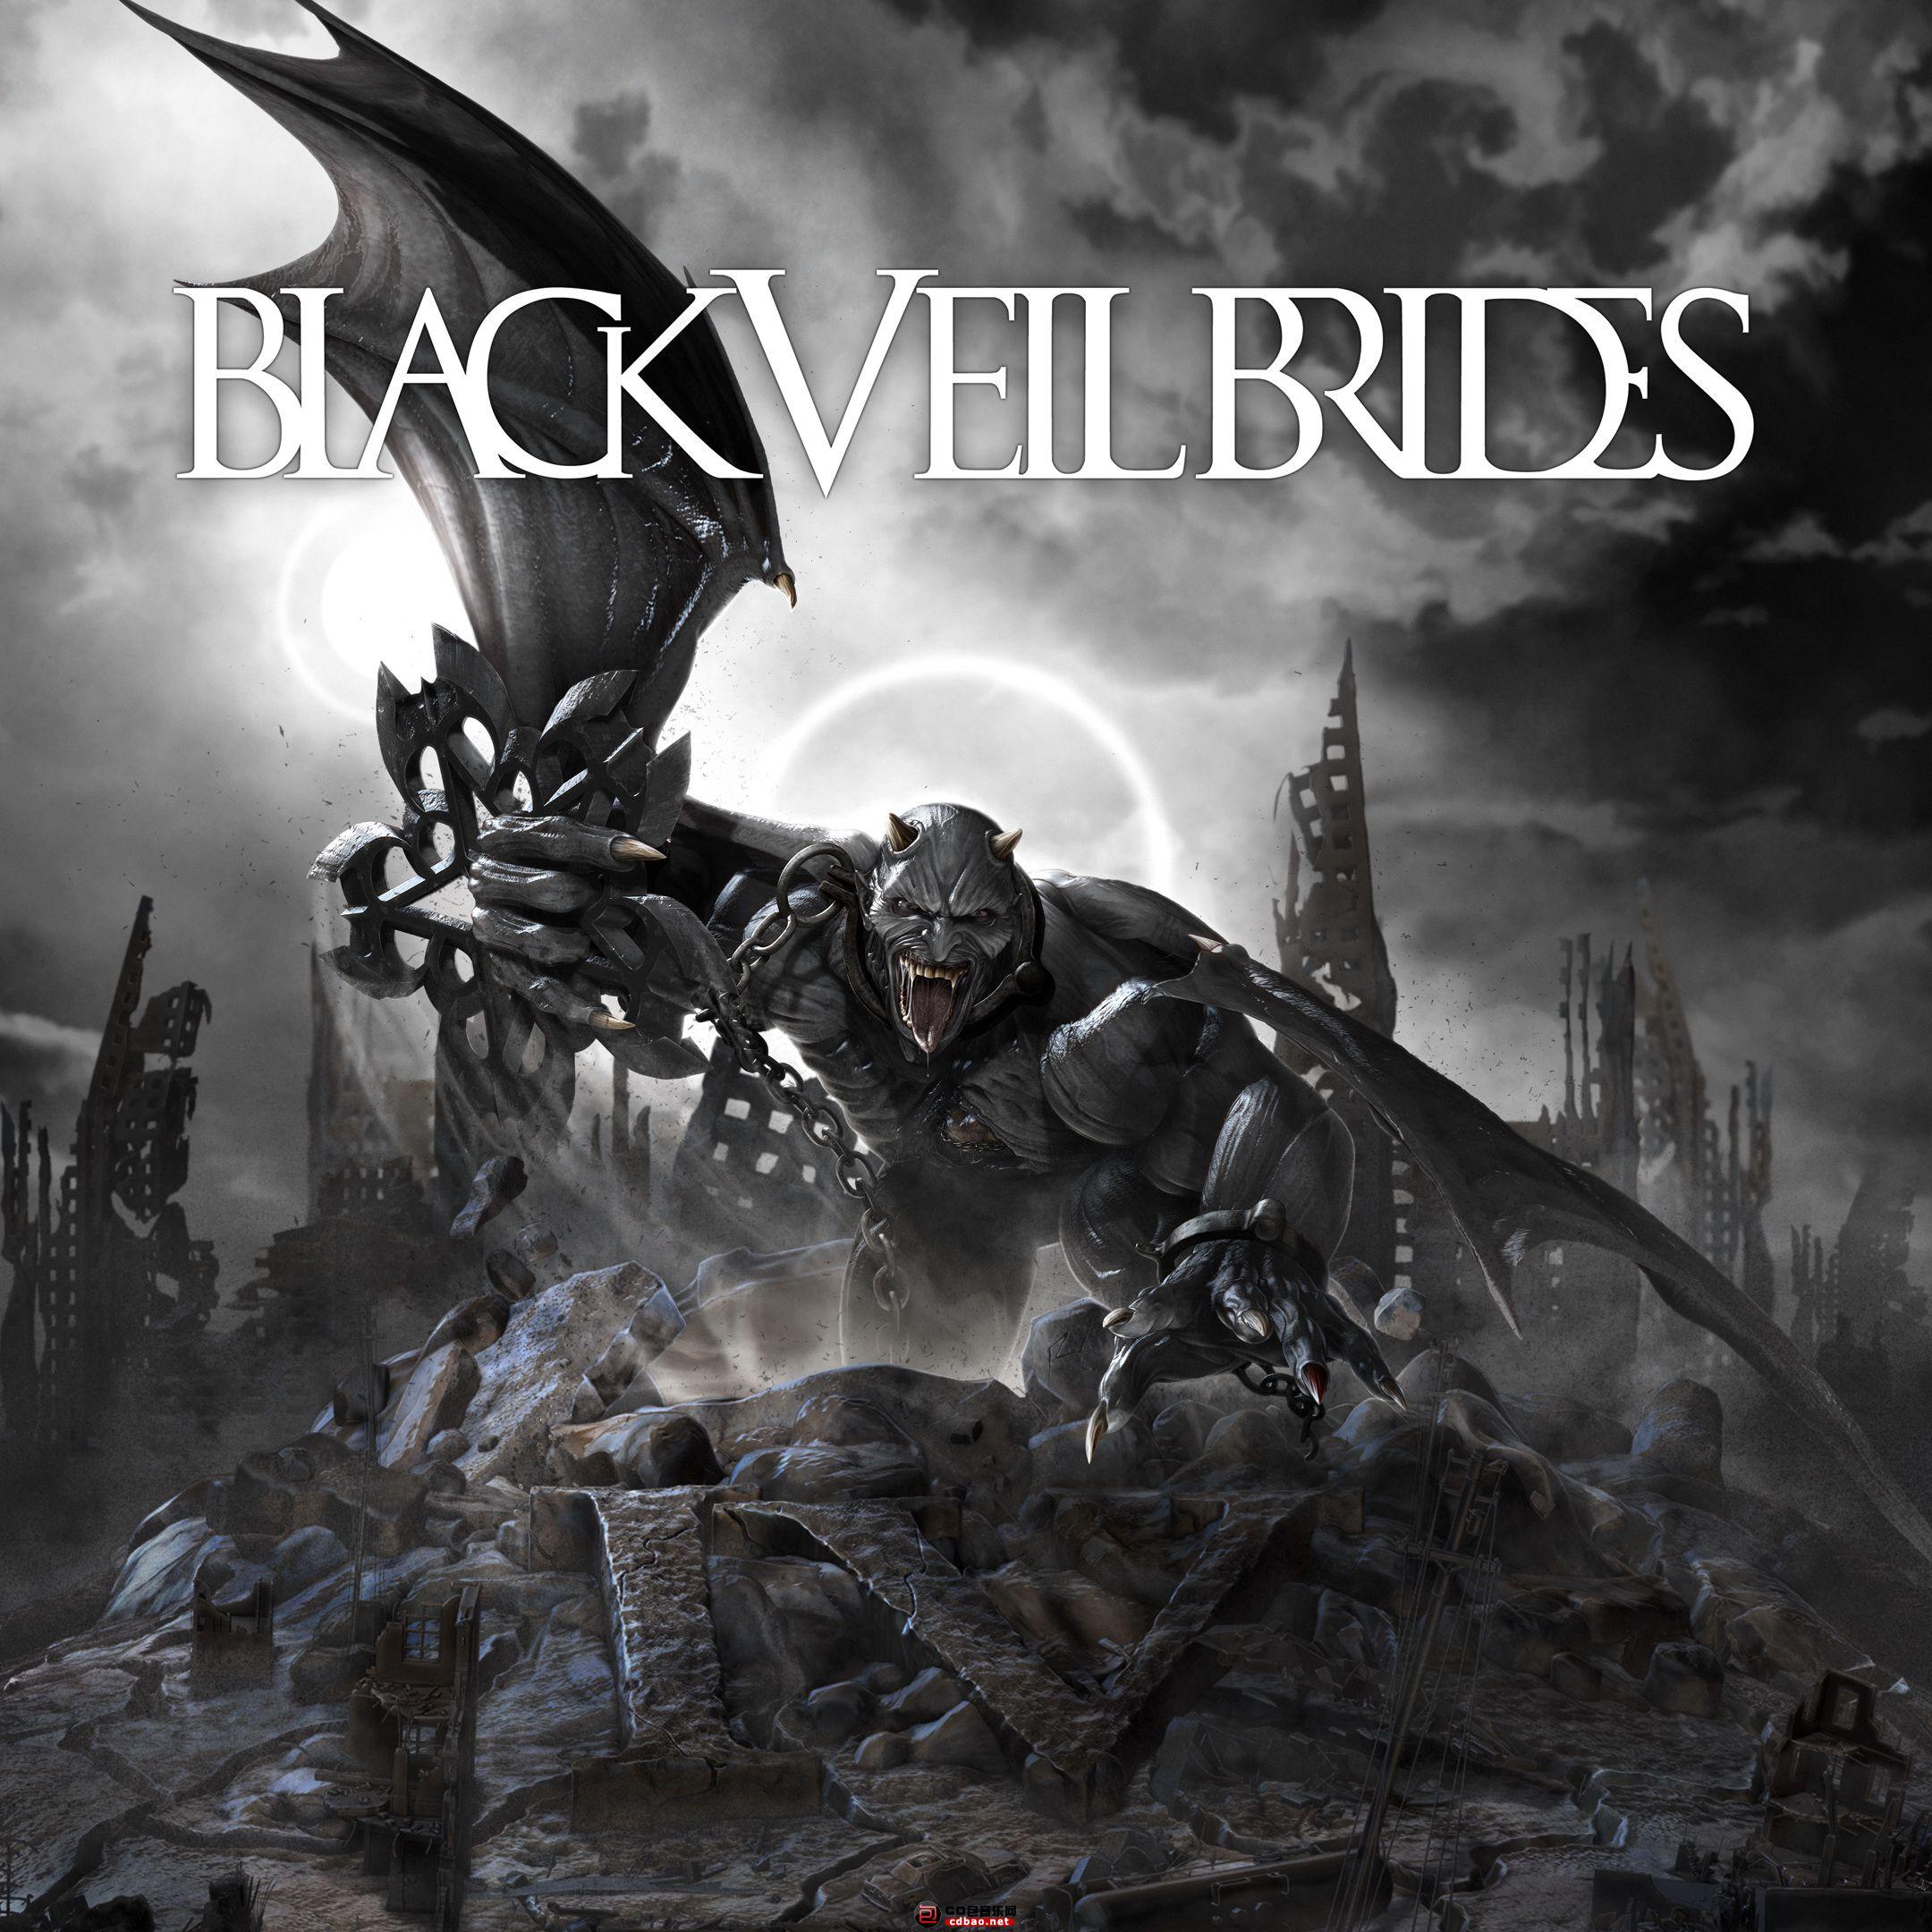 Black Veil Brides - Black Veil Brides (2014).jpg